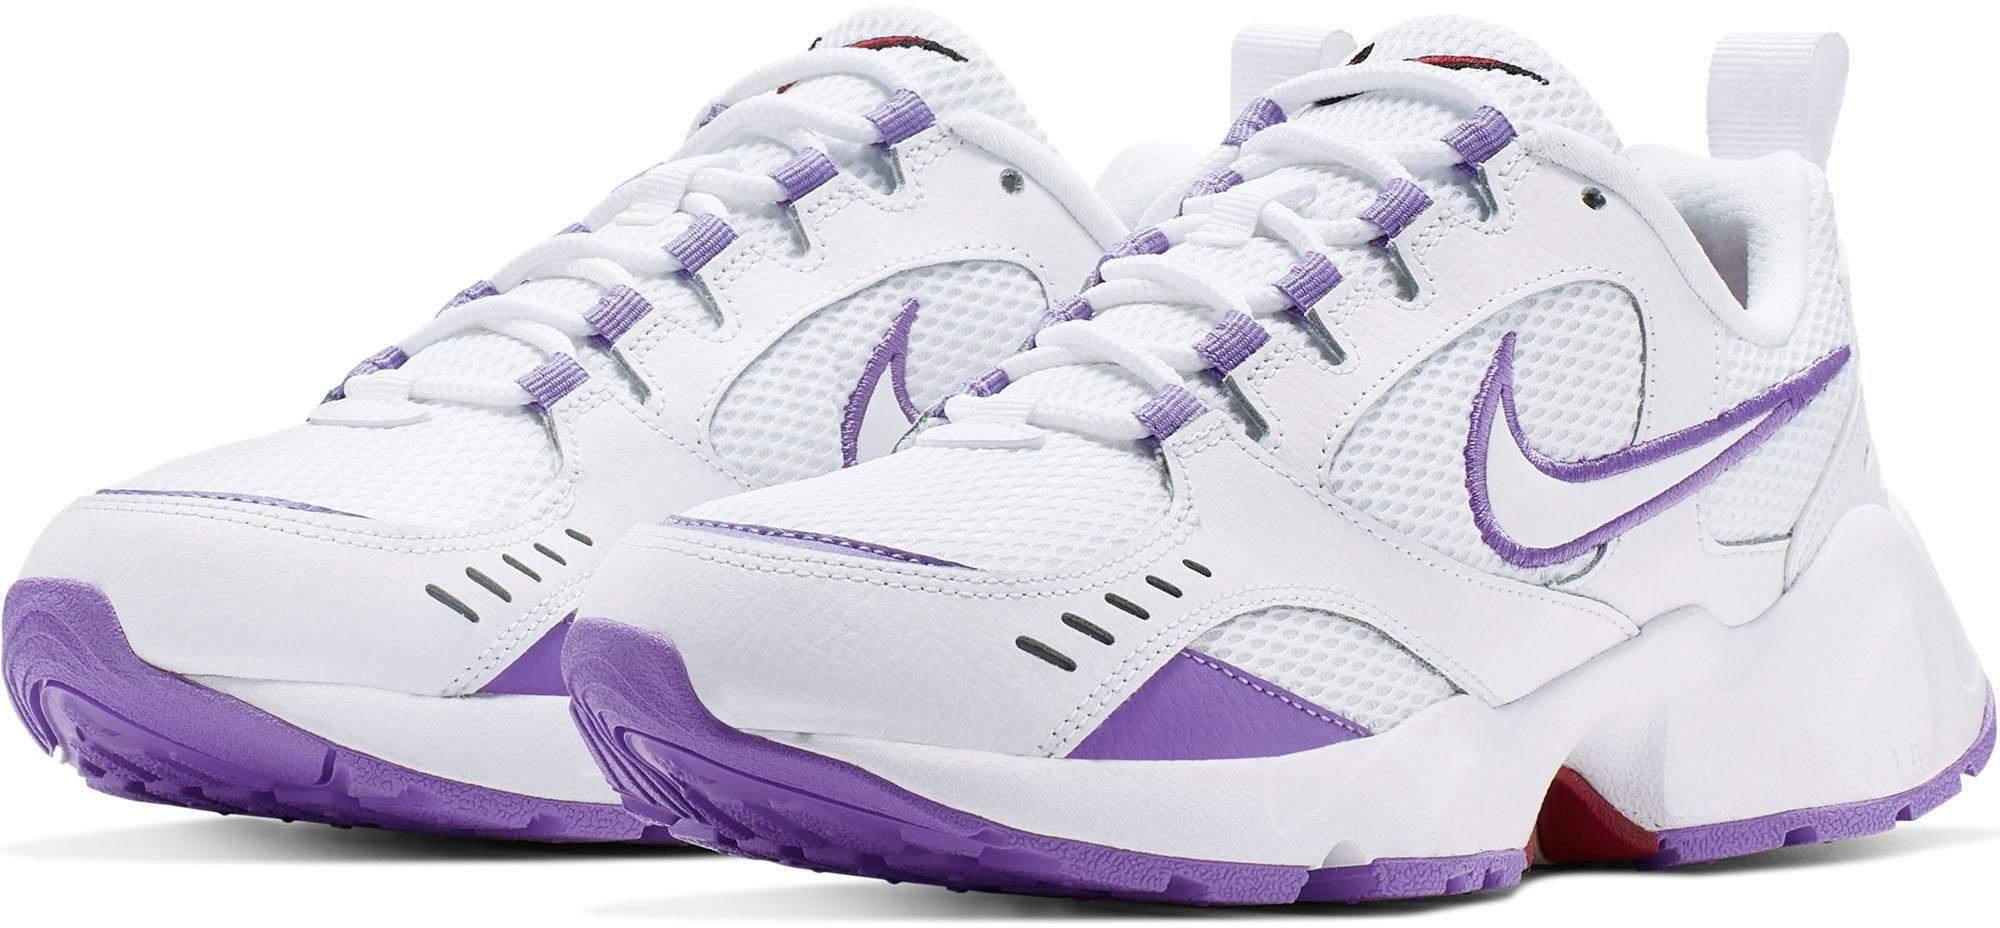 Nike Sportswear »Wmns Air Heights« Sneaker kaufen | OTTO